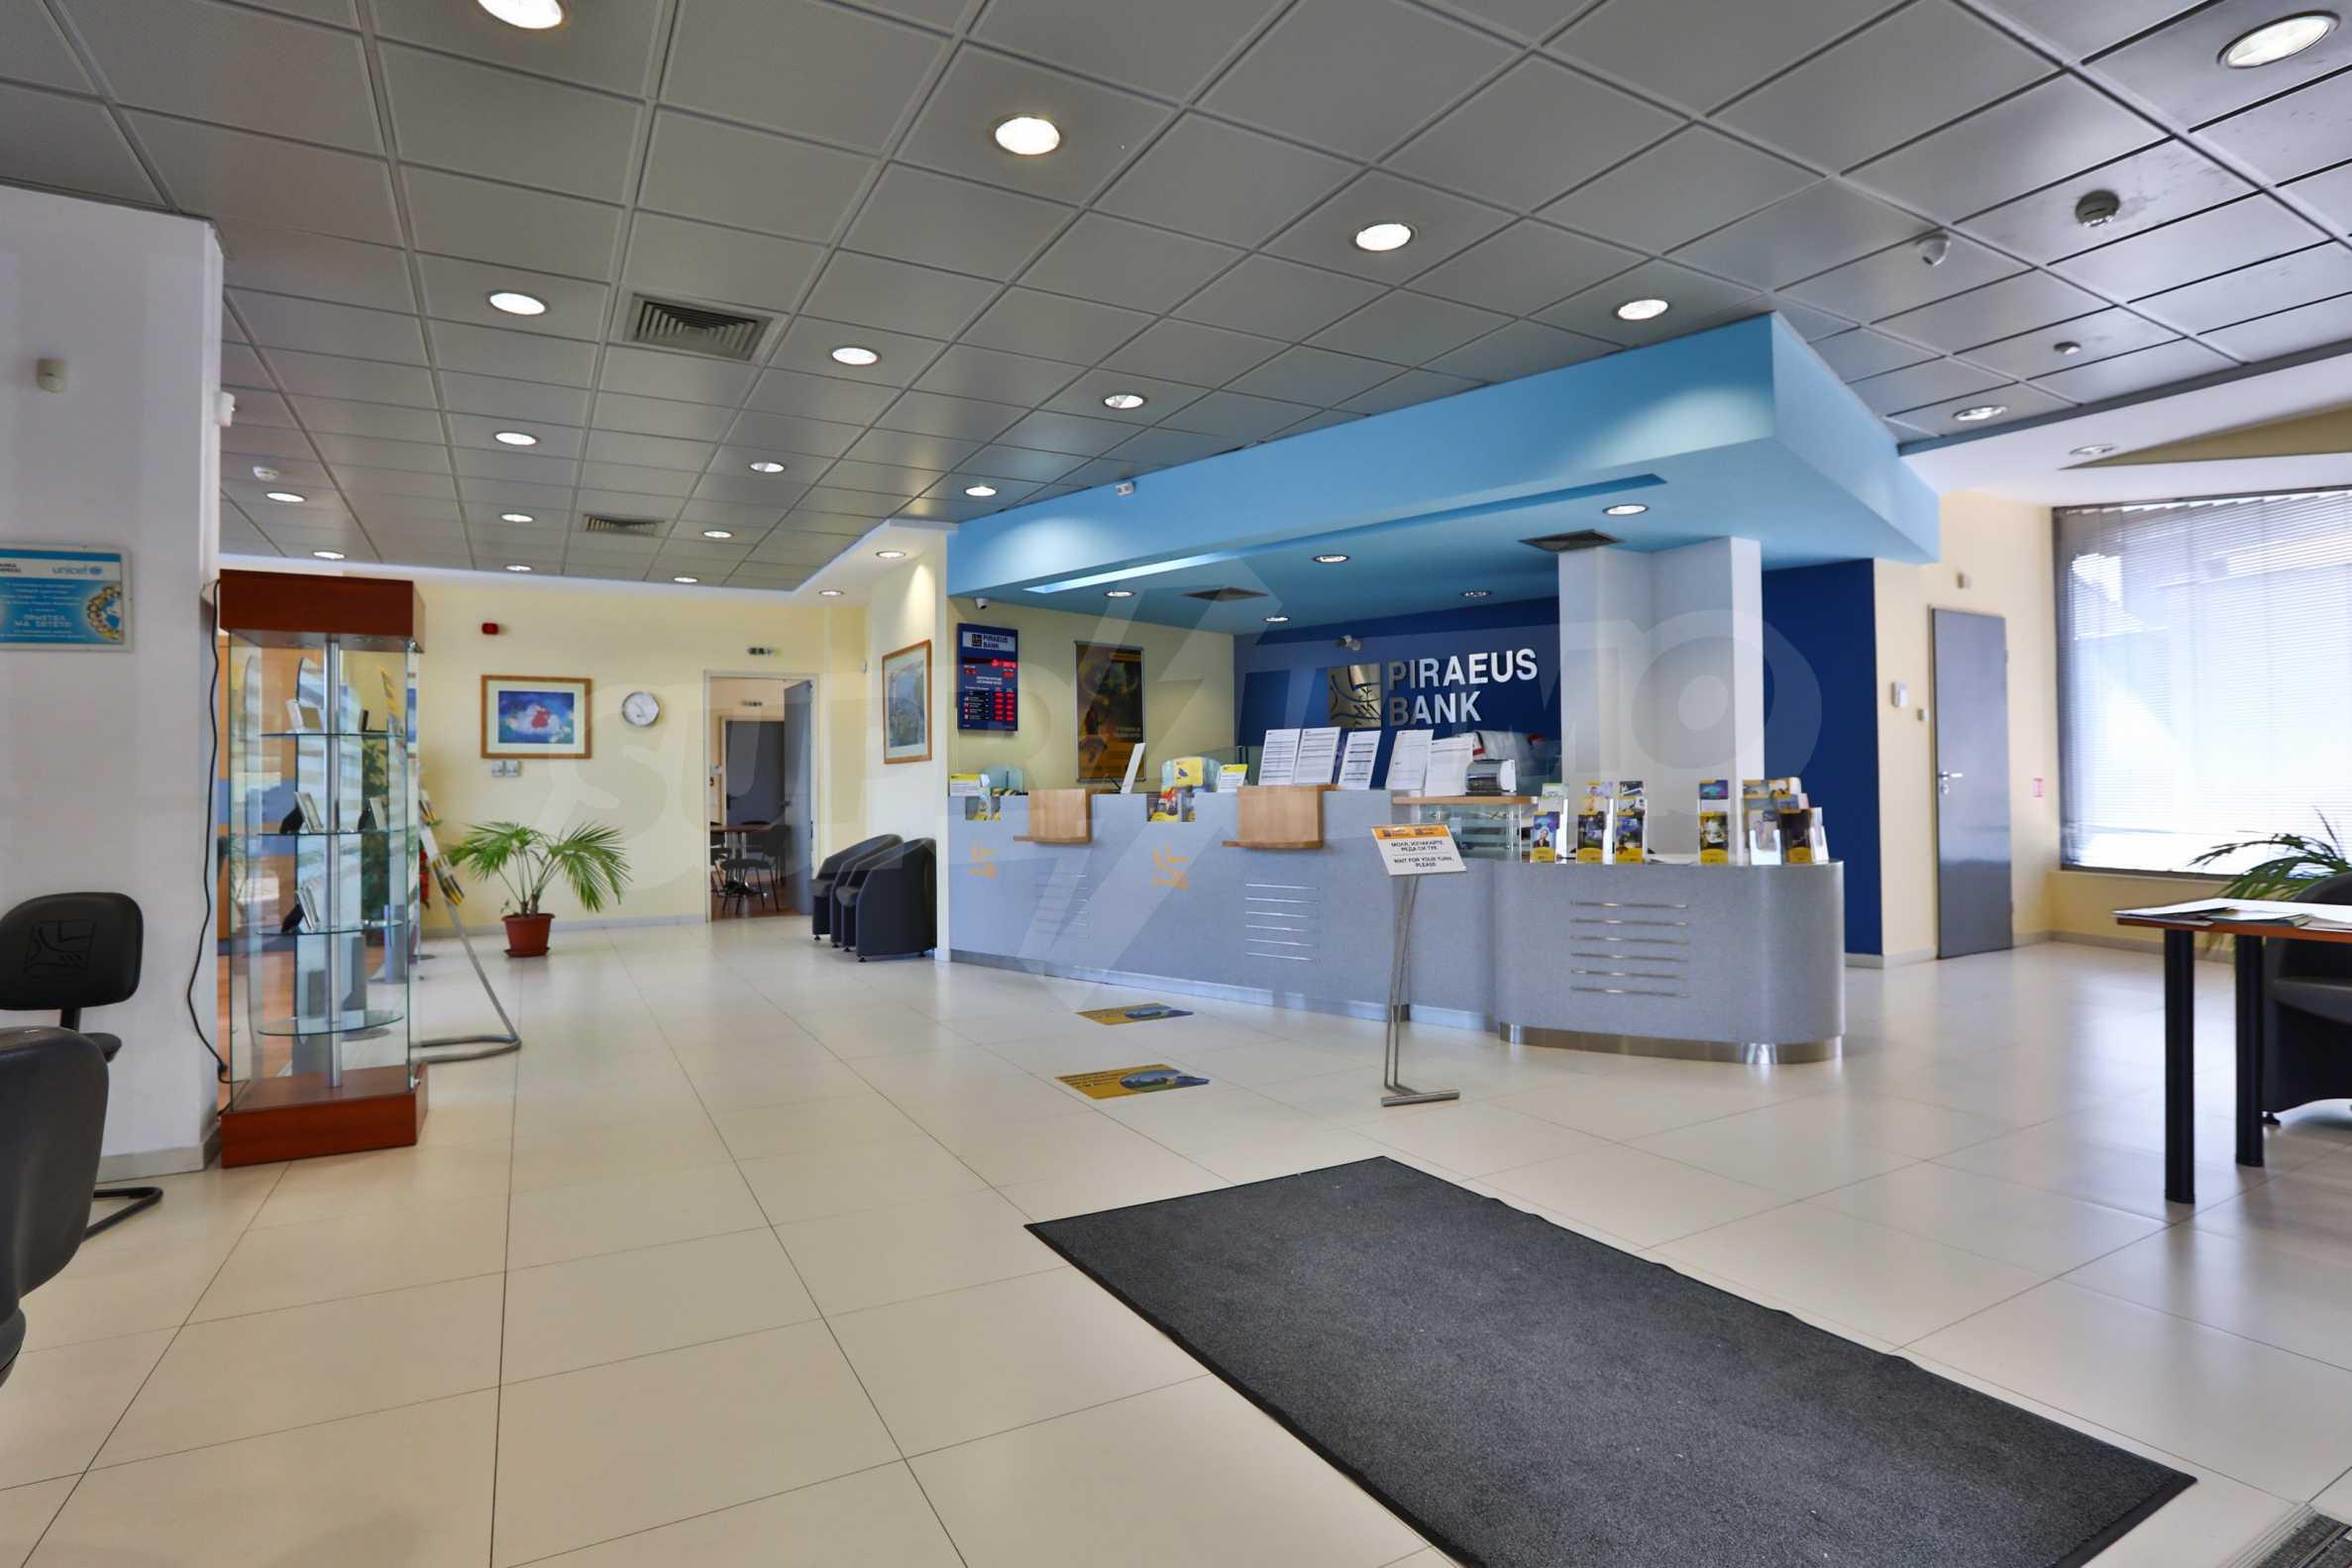 Офис в бизнес сграда висок клас на бул. Цариградско шосе 1